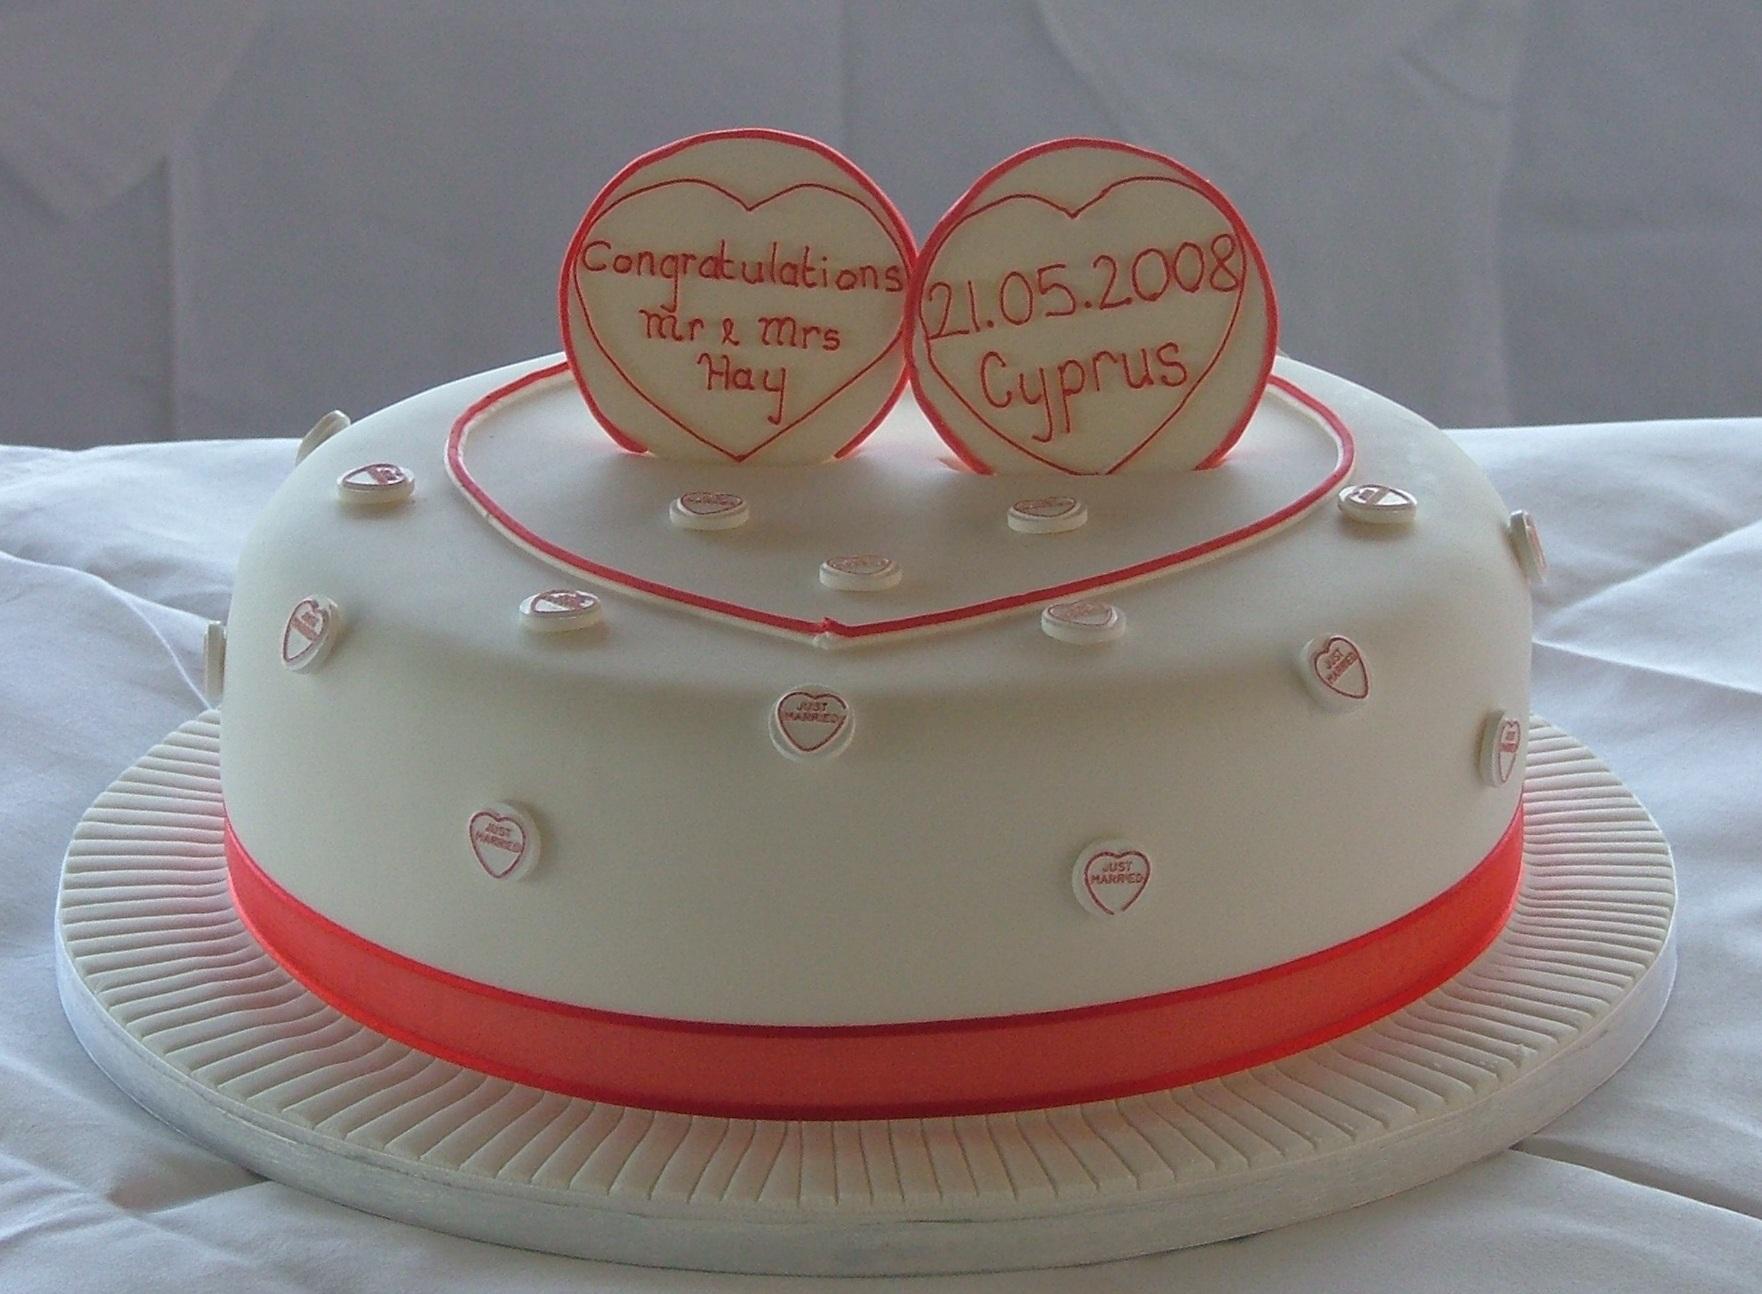 Cake Making Classes Lancashire : Single Tier Wedding Cakes - Too Nice to Slice